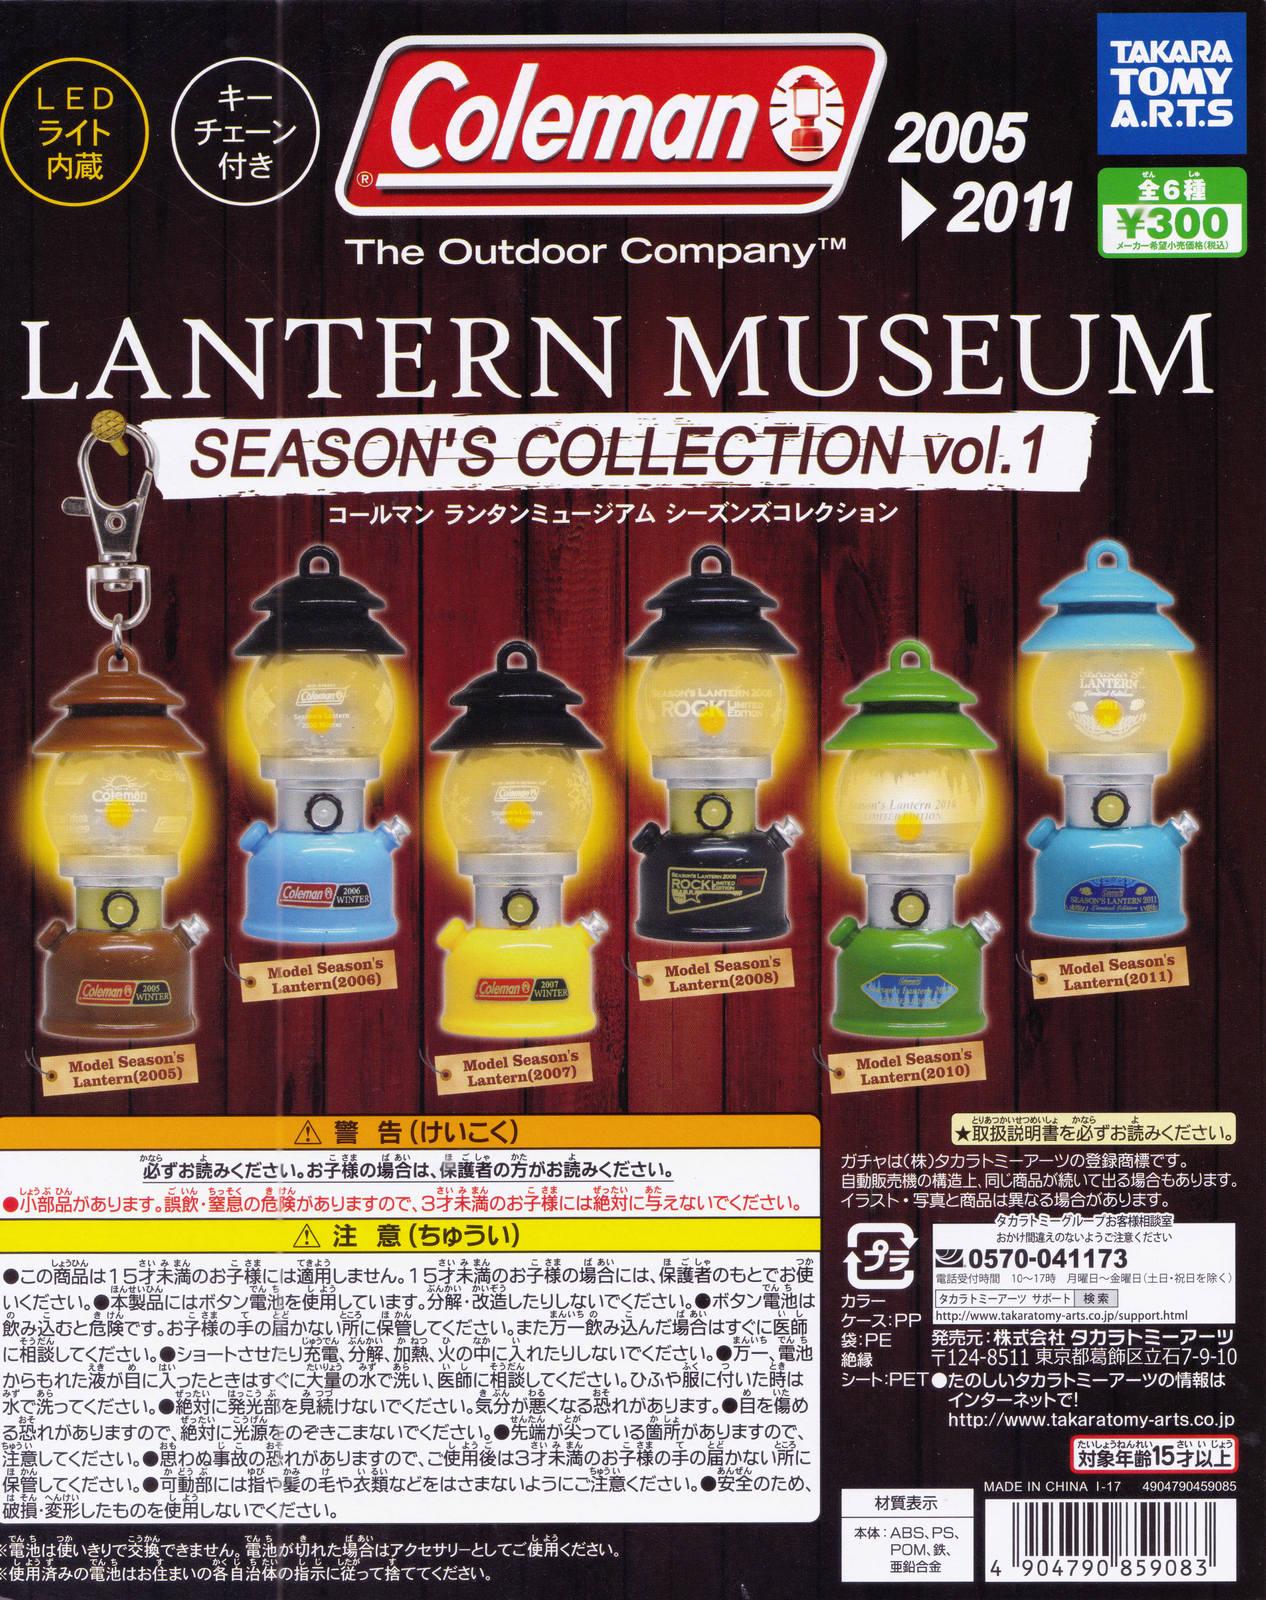 TAKARA TOMY ARTS Coleman LANTERN MUSEUM SEASON COLLECTION VOL 1 2005 LED BROWN